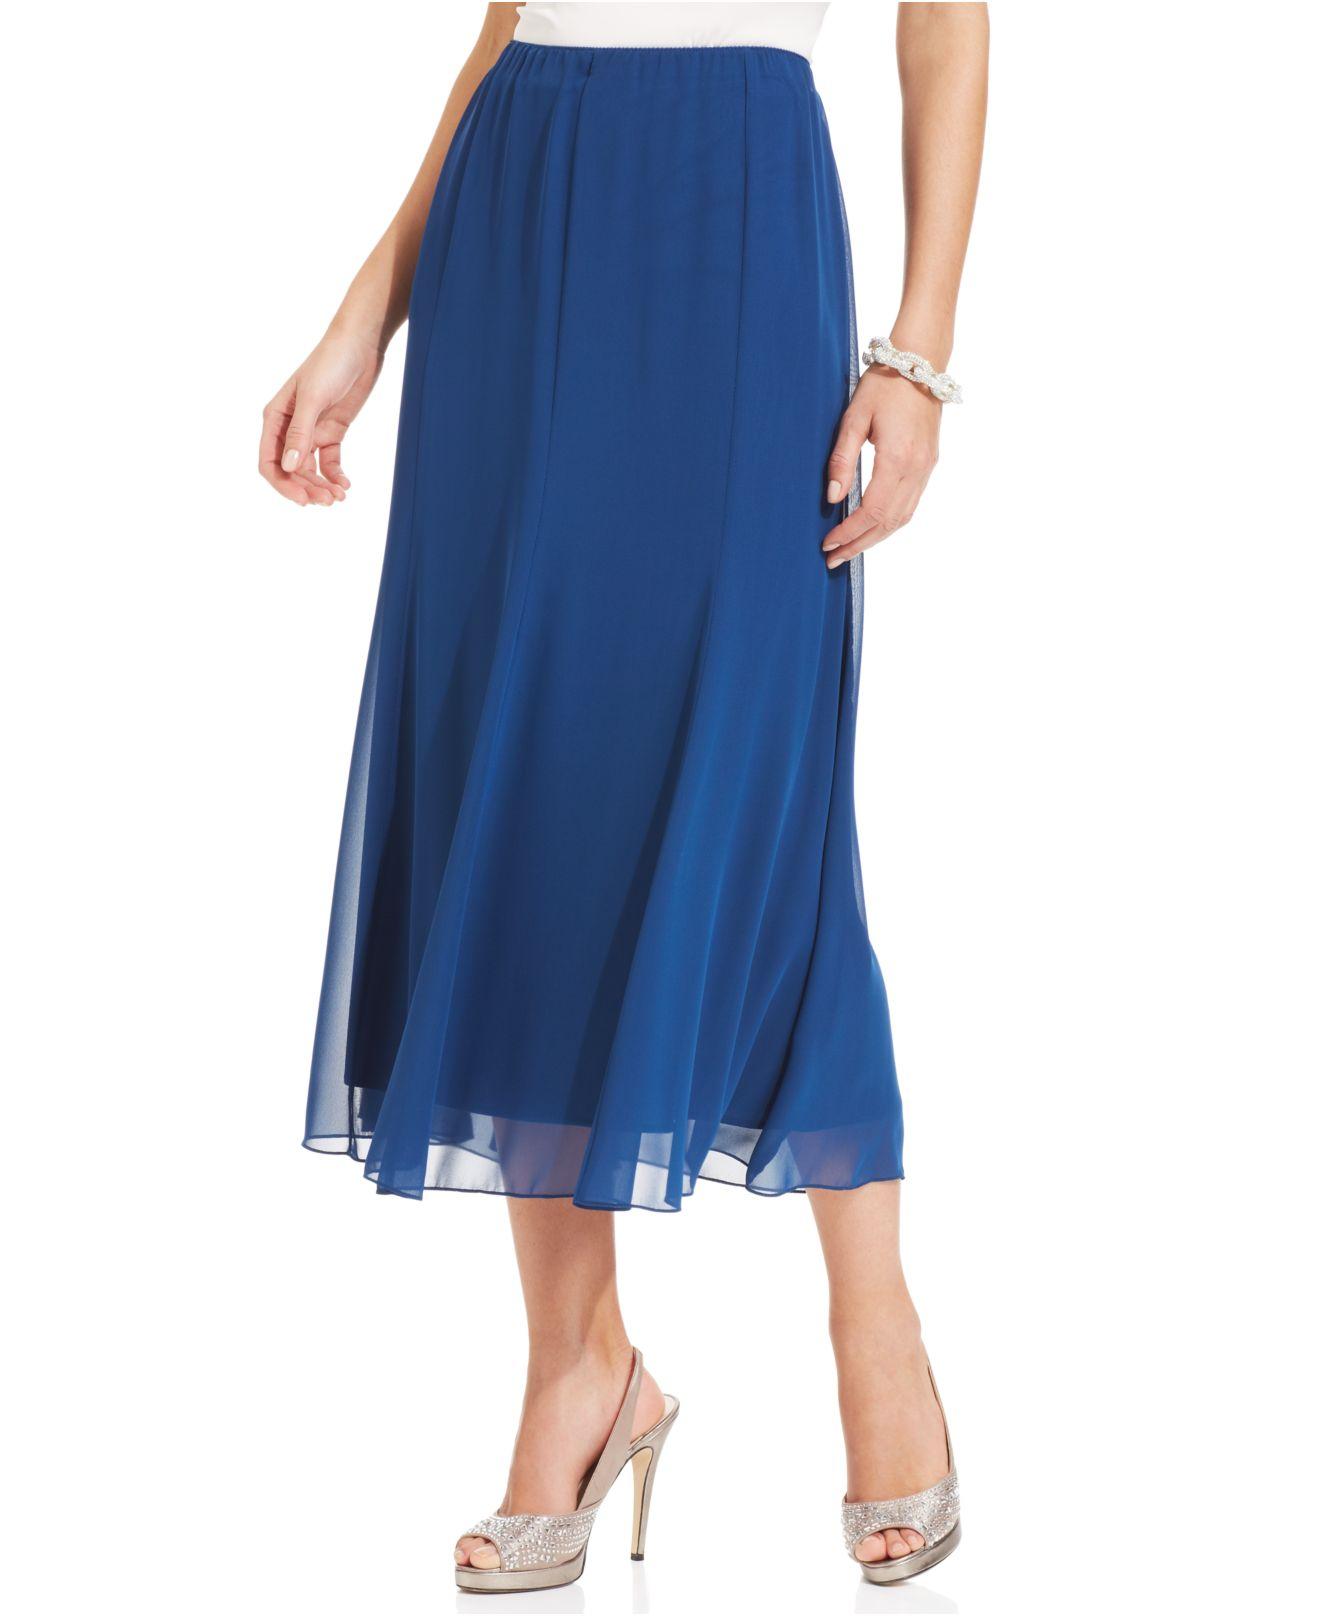 alex evenings chiffon tea length skirt in blue lyst